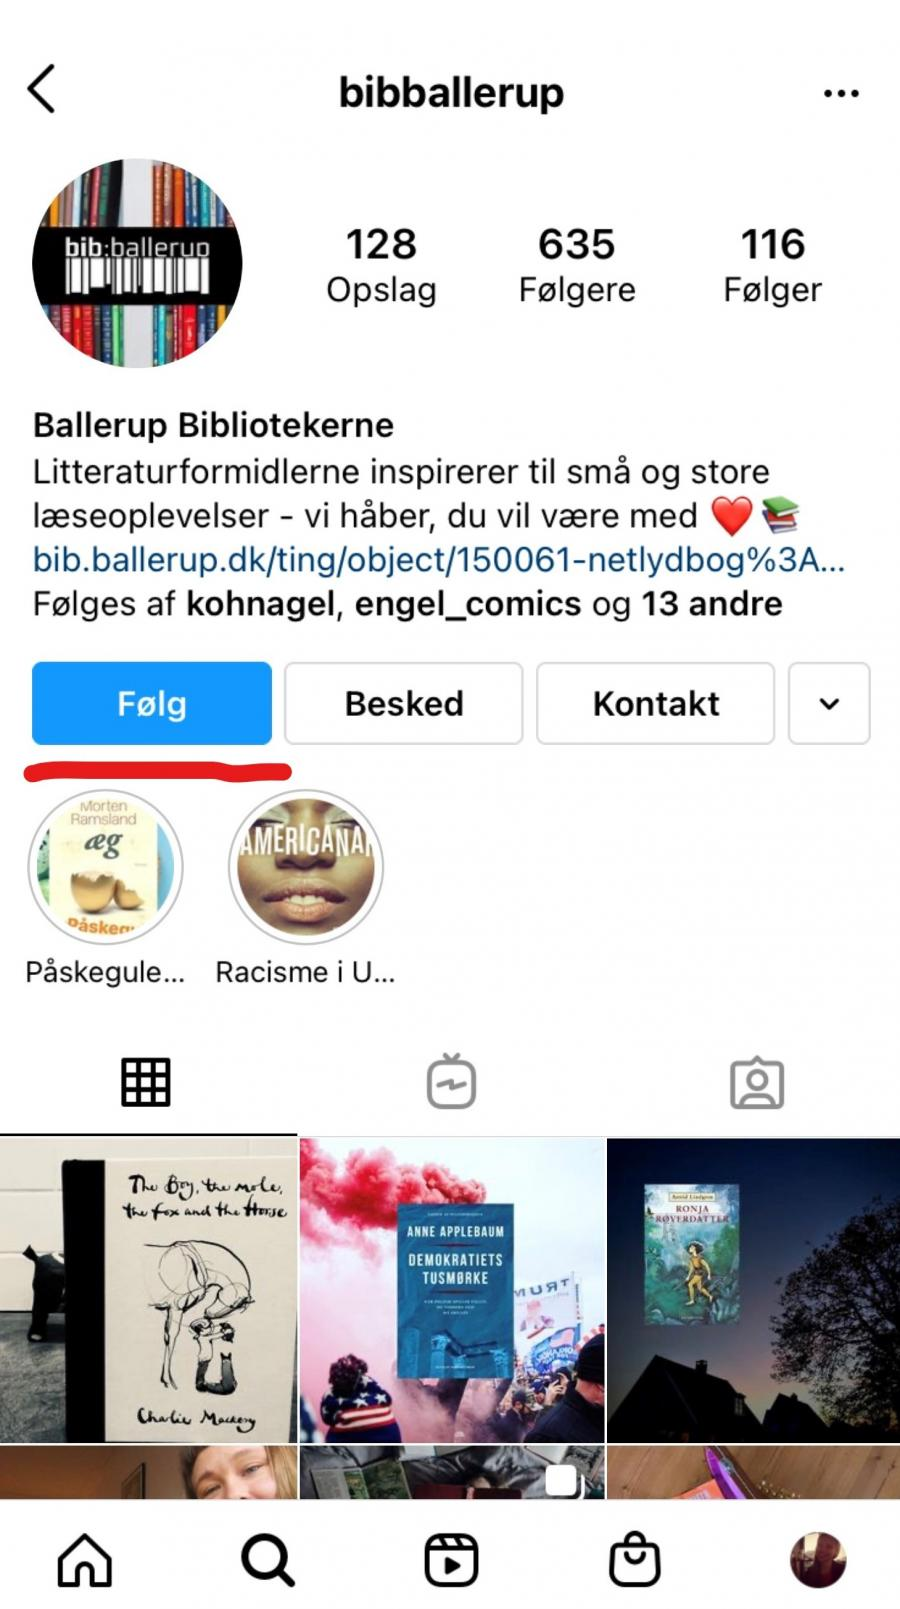 Følg en profil